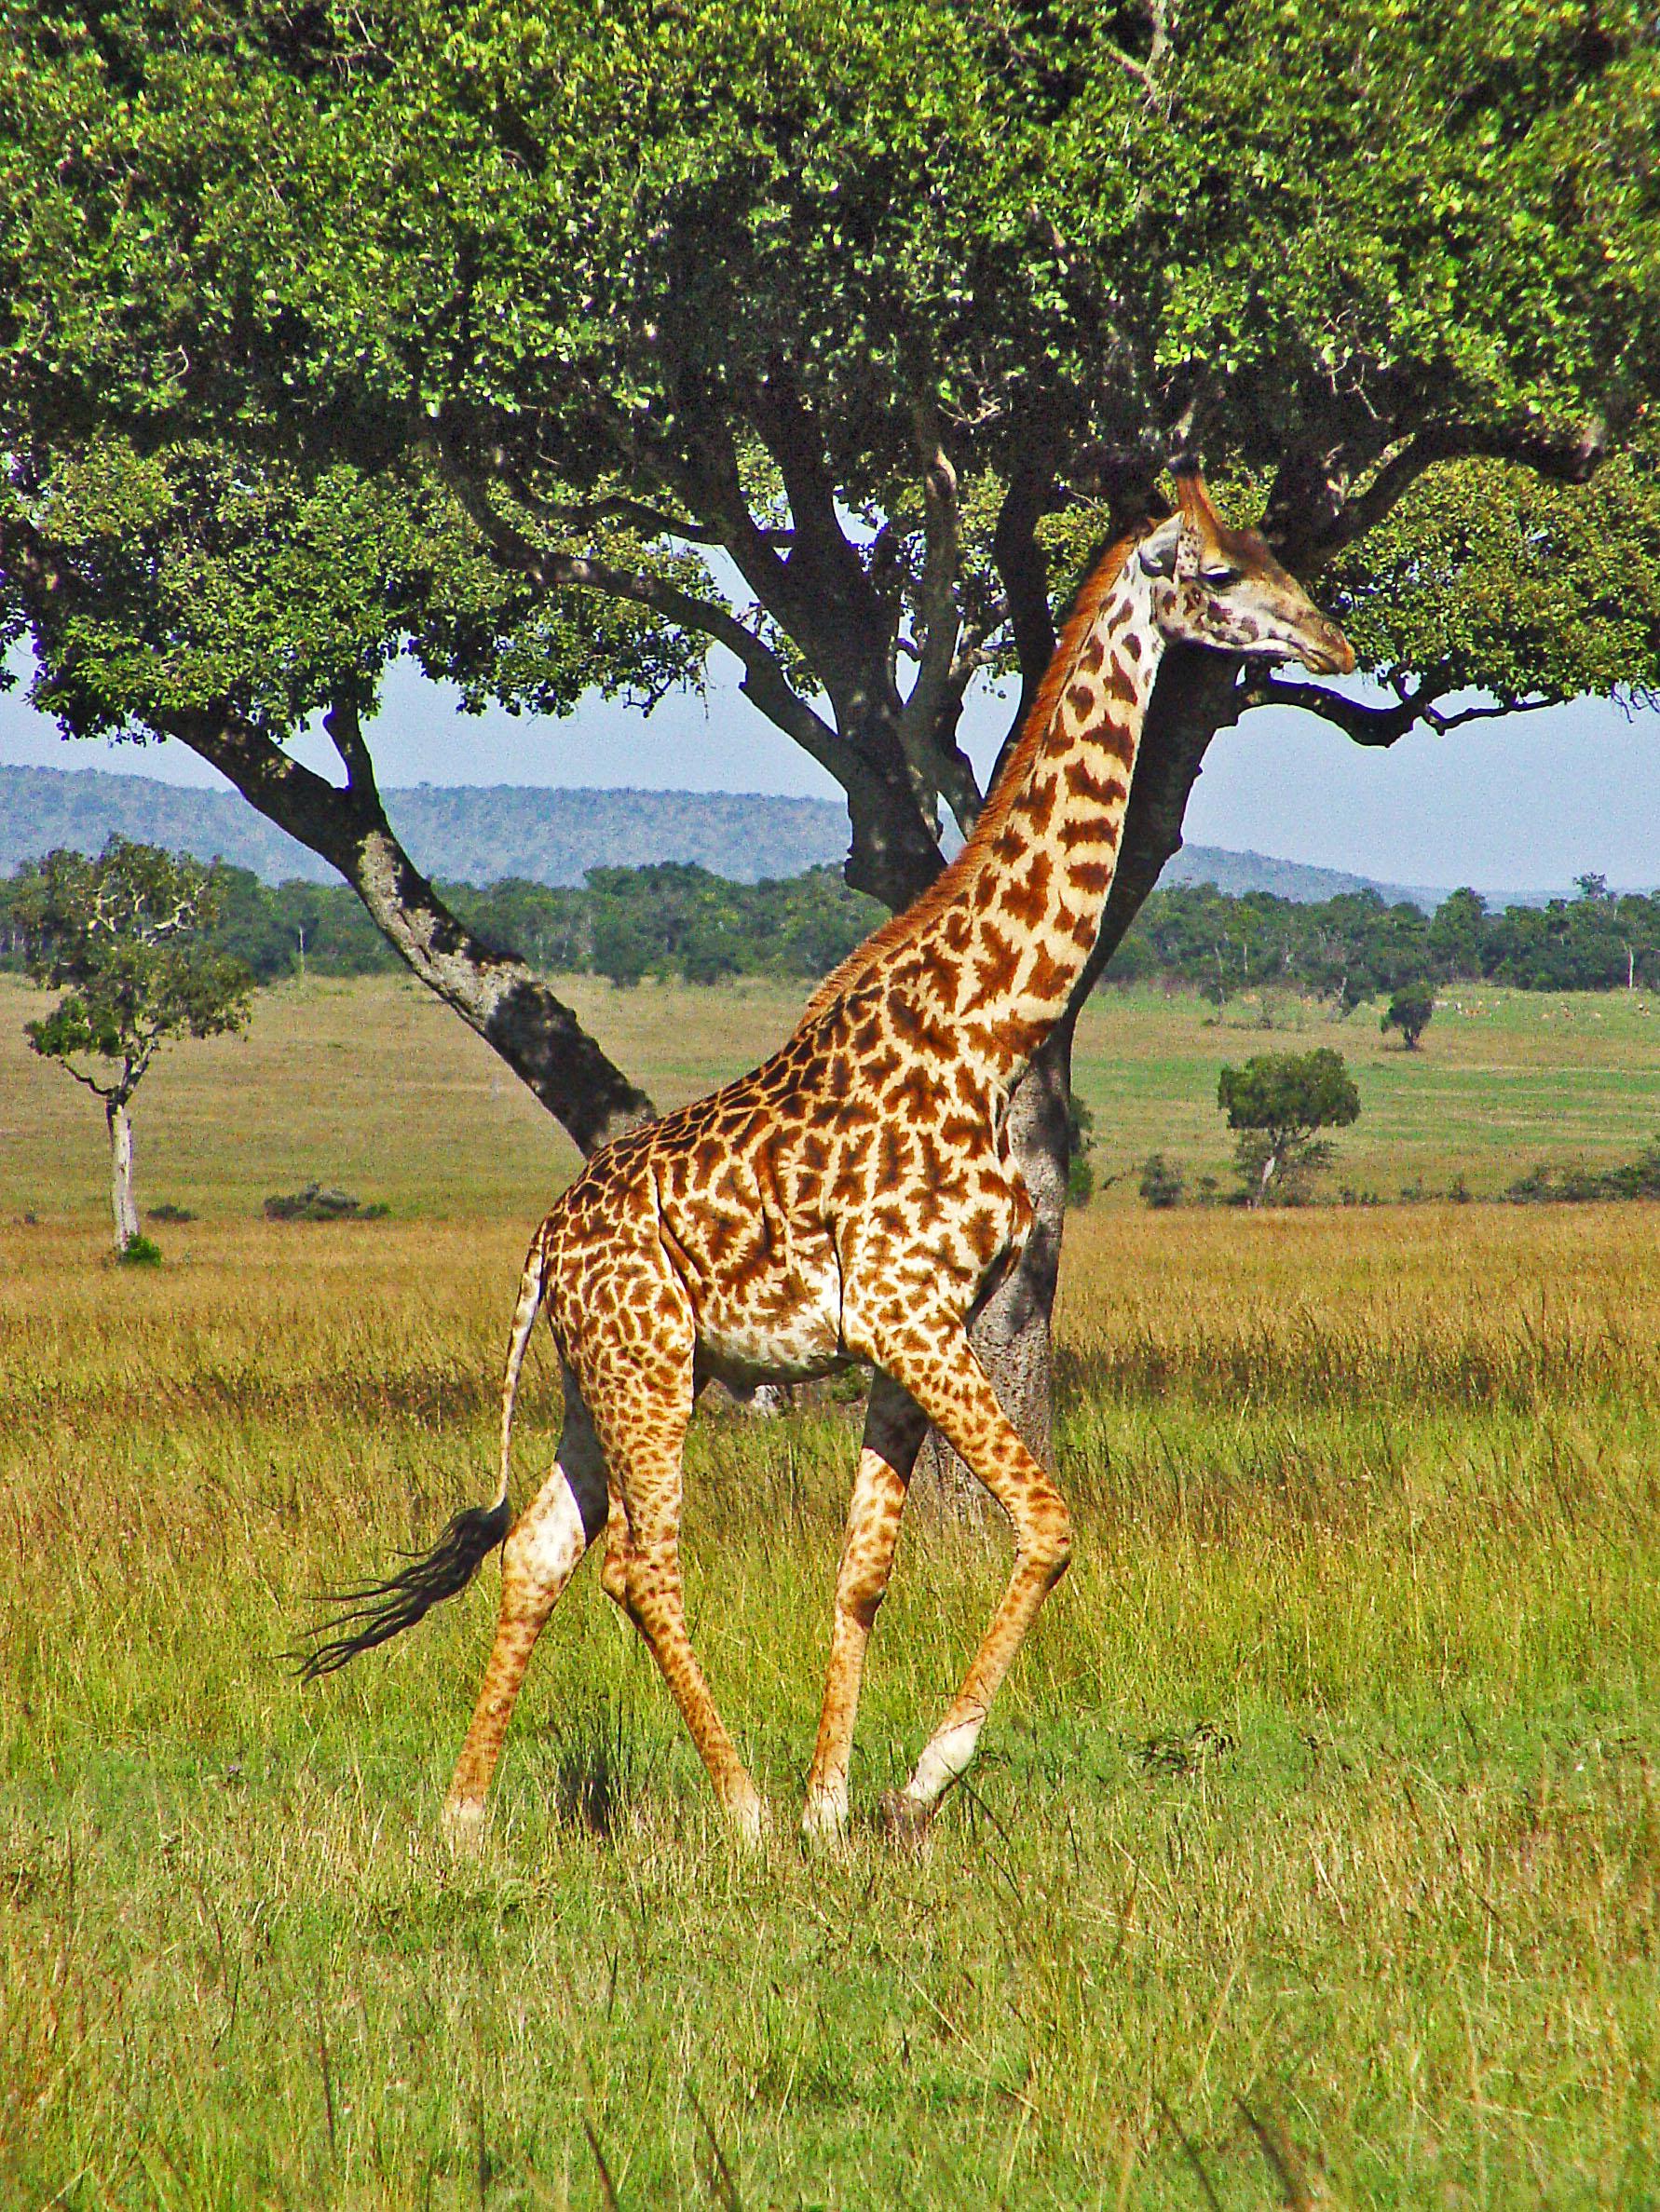 Giraffe Academy - steps towards teacher professionalism